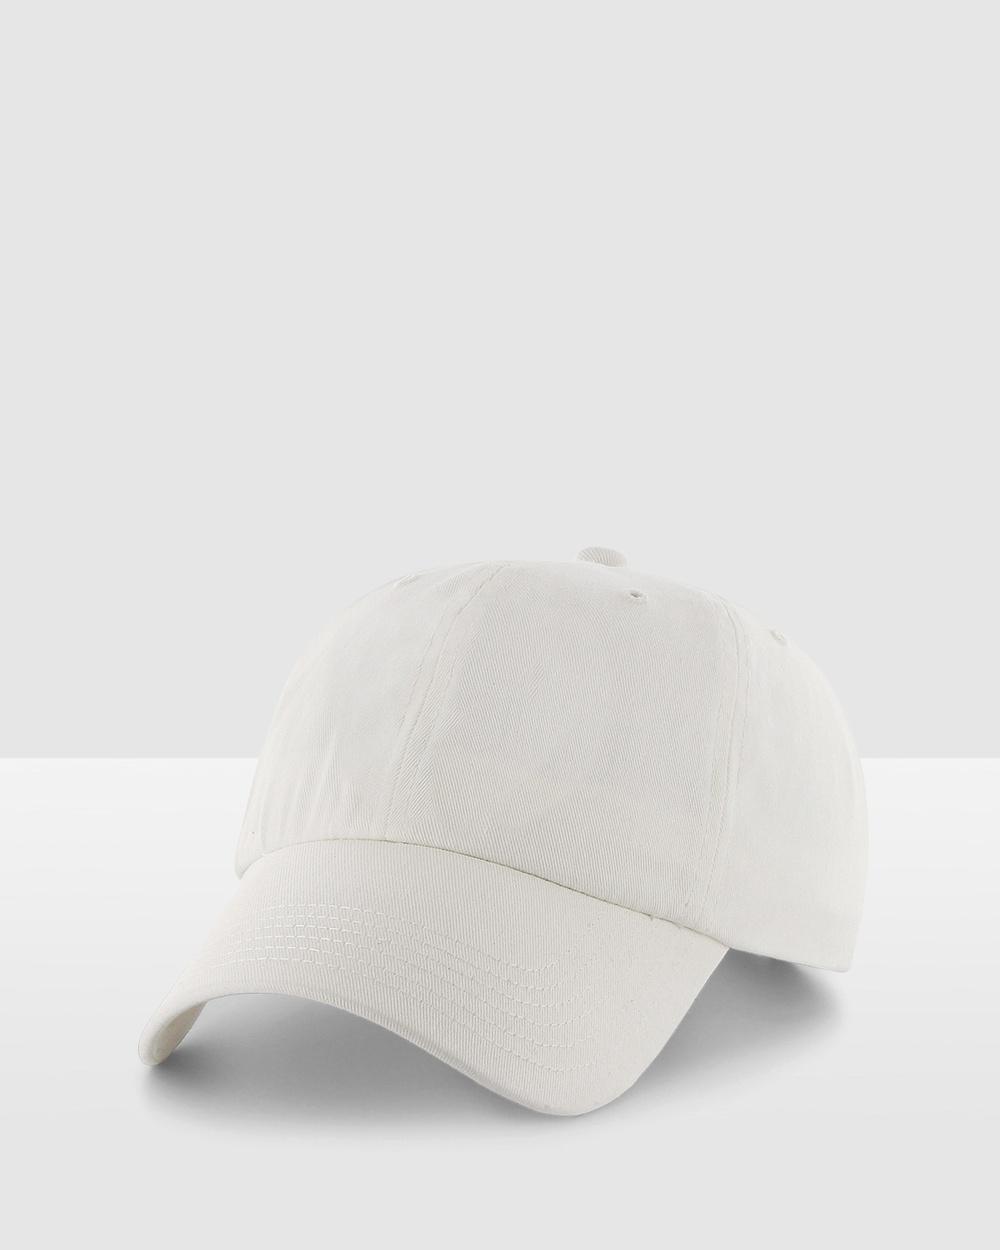 47 Classic White '47 CLEAN UP Headwear white